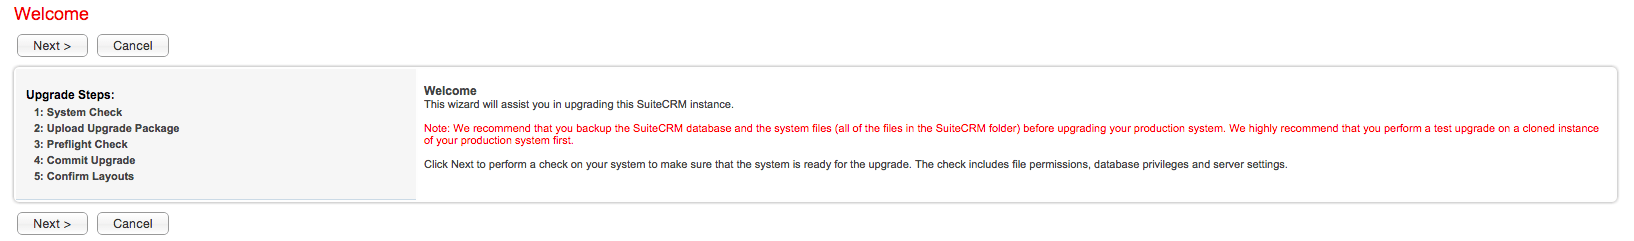 SuiteCRM upgrade